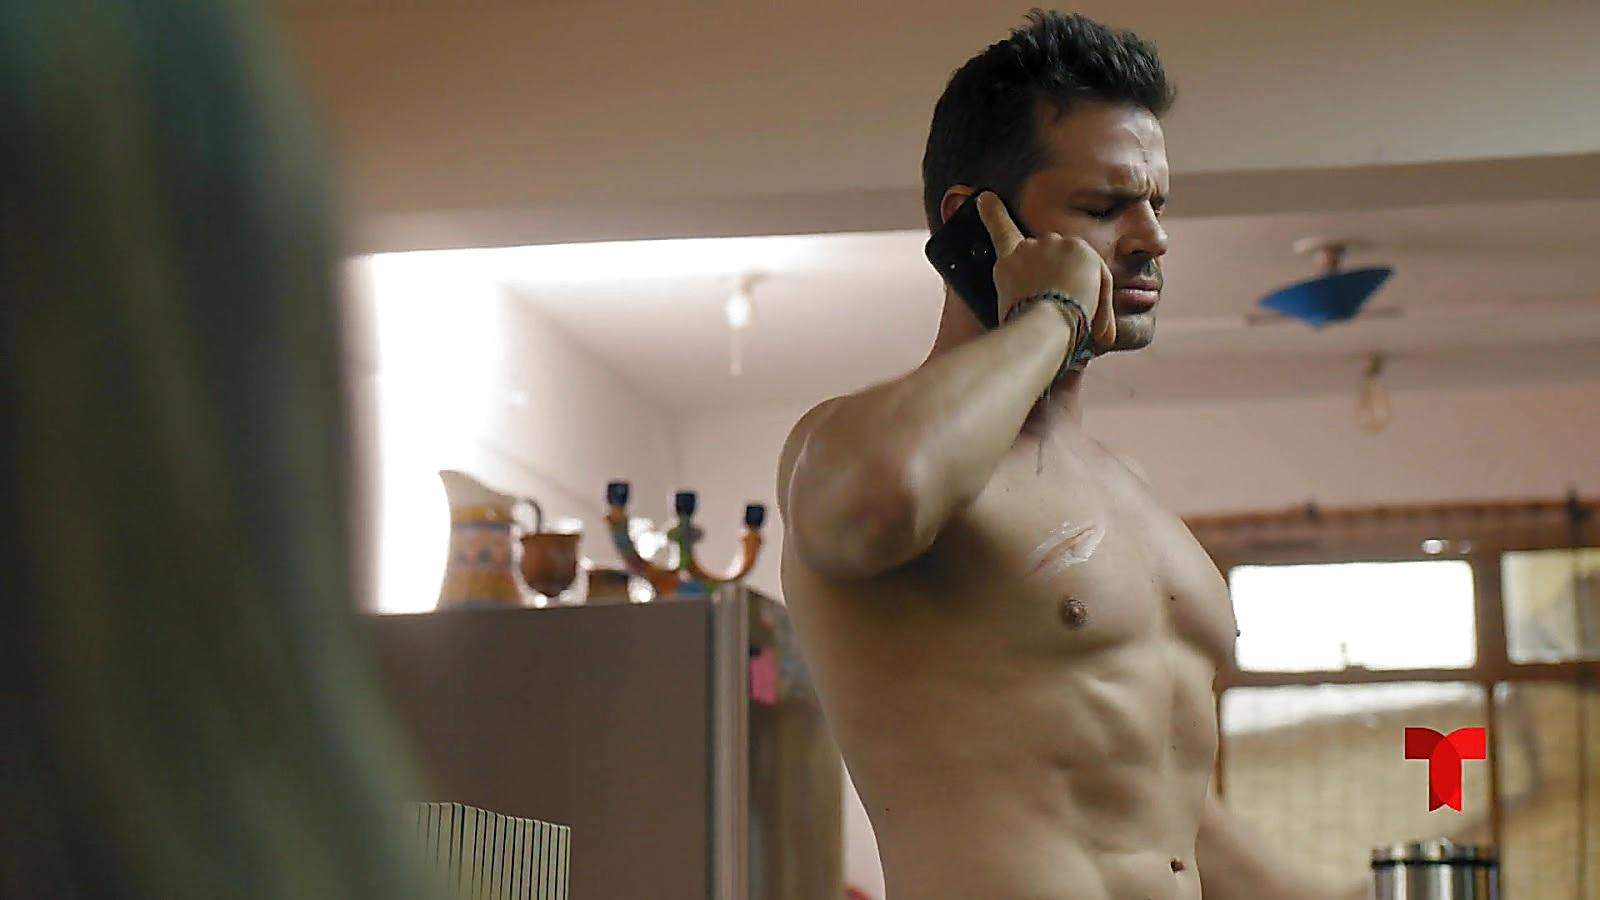 Mark Tacher sexy shirtless scene April 8, 2020, 6am